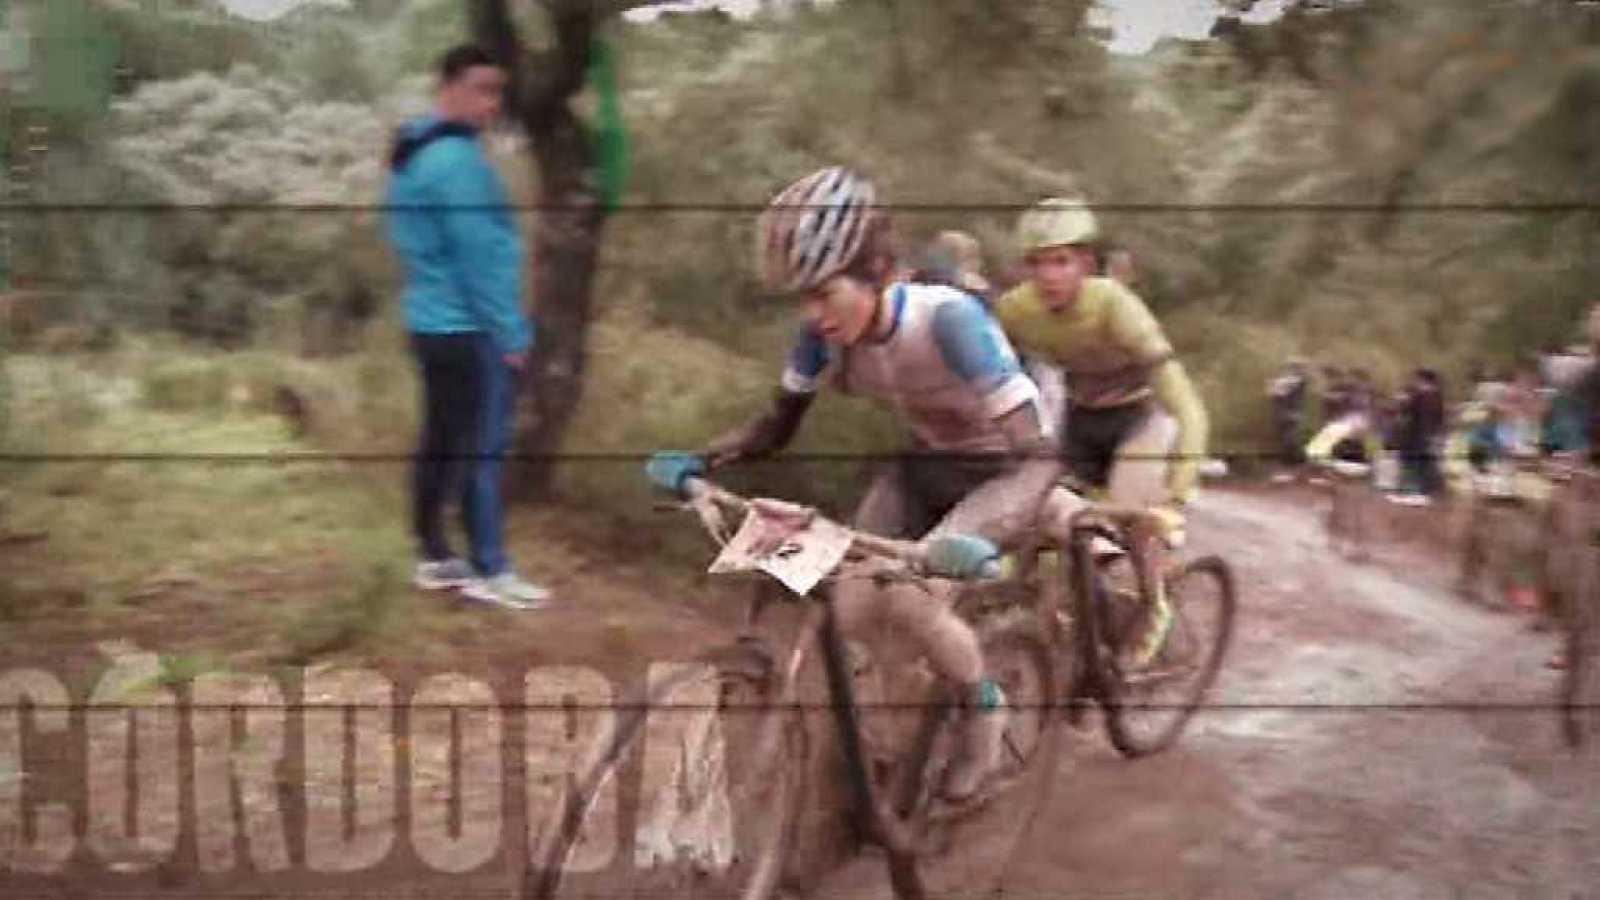 Circuito Xco Moralzarzal : Mountain bike vuelta córdoba btt 2018 rtve.es